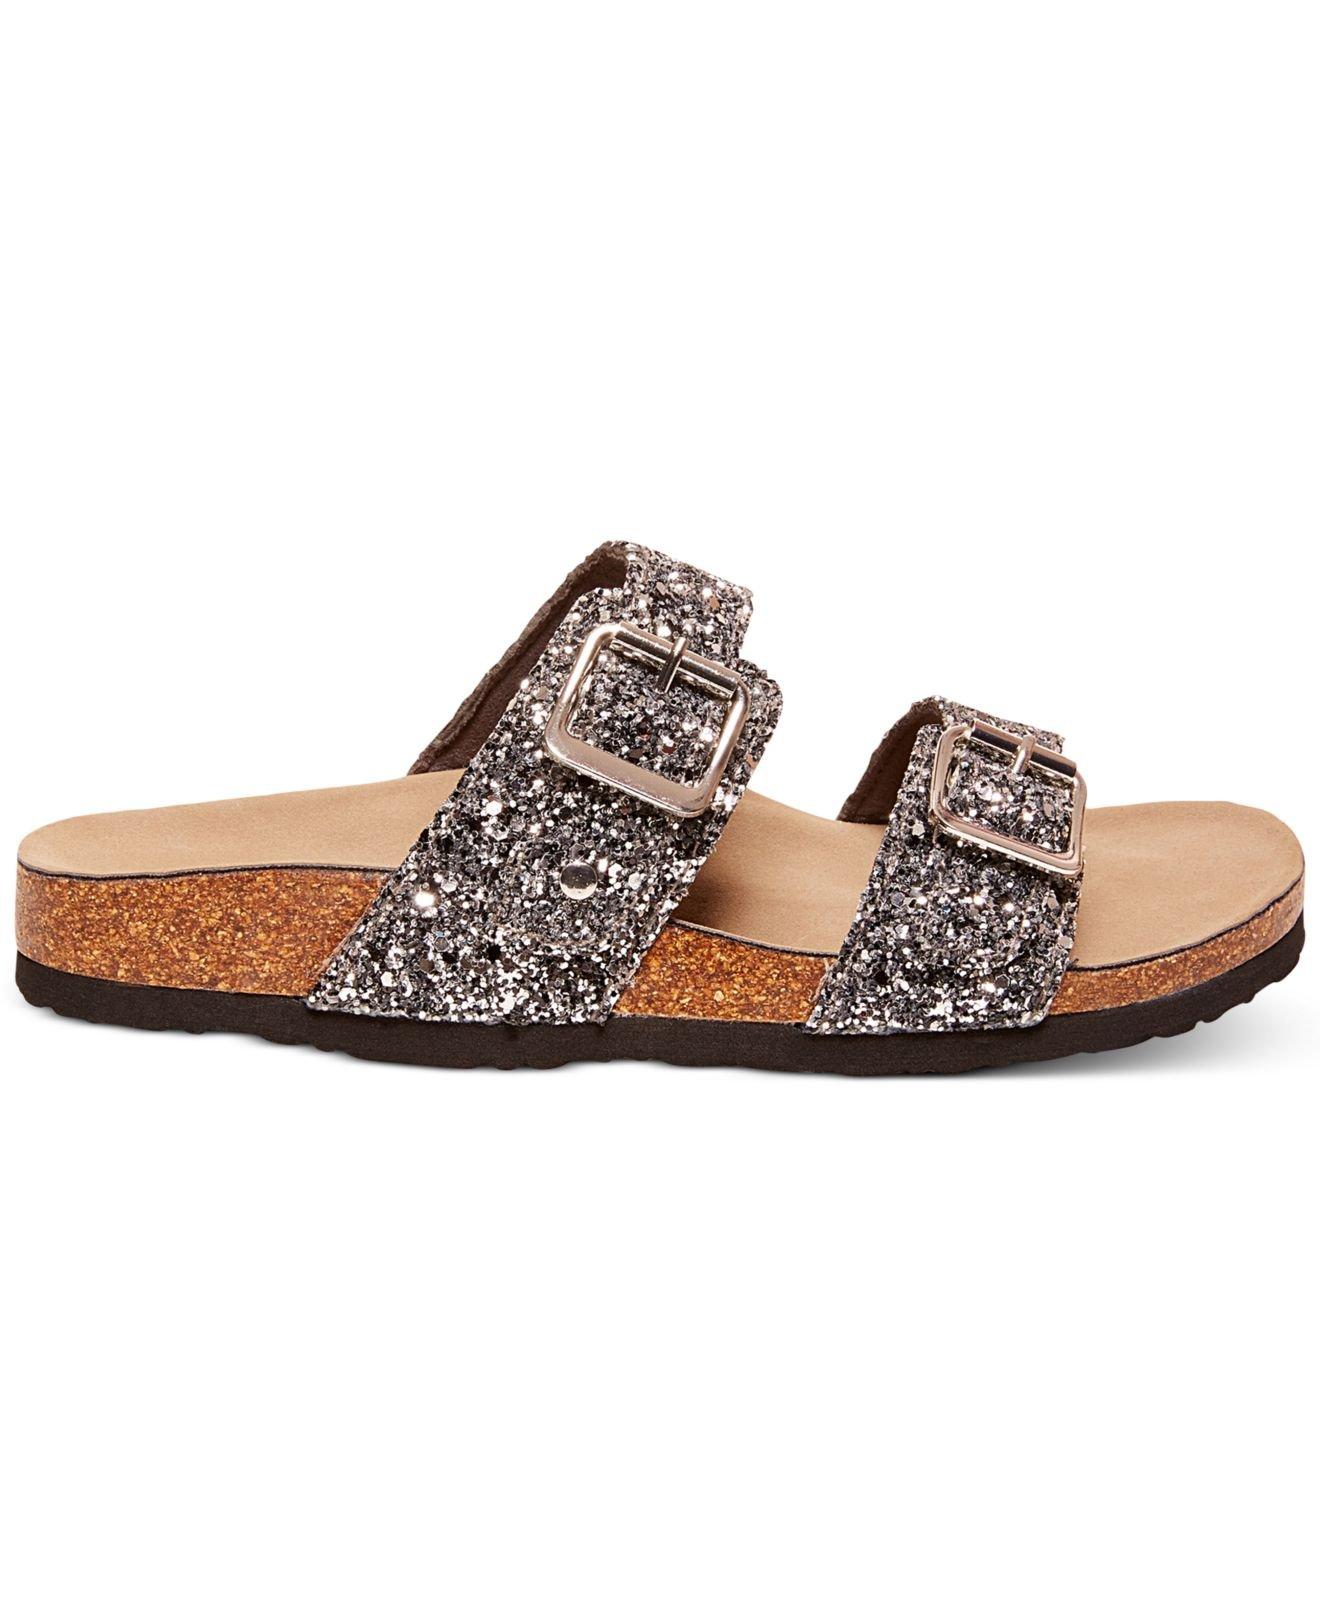 462fb1deb66c Madden Girl Brando Glitter Faux-Leather Sandals in Metallic - Lyst